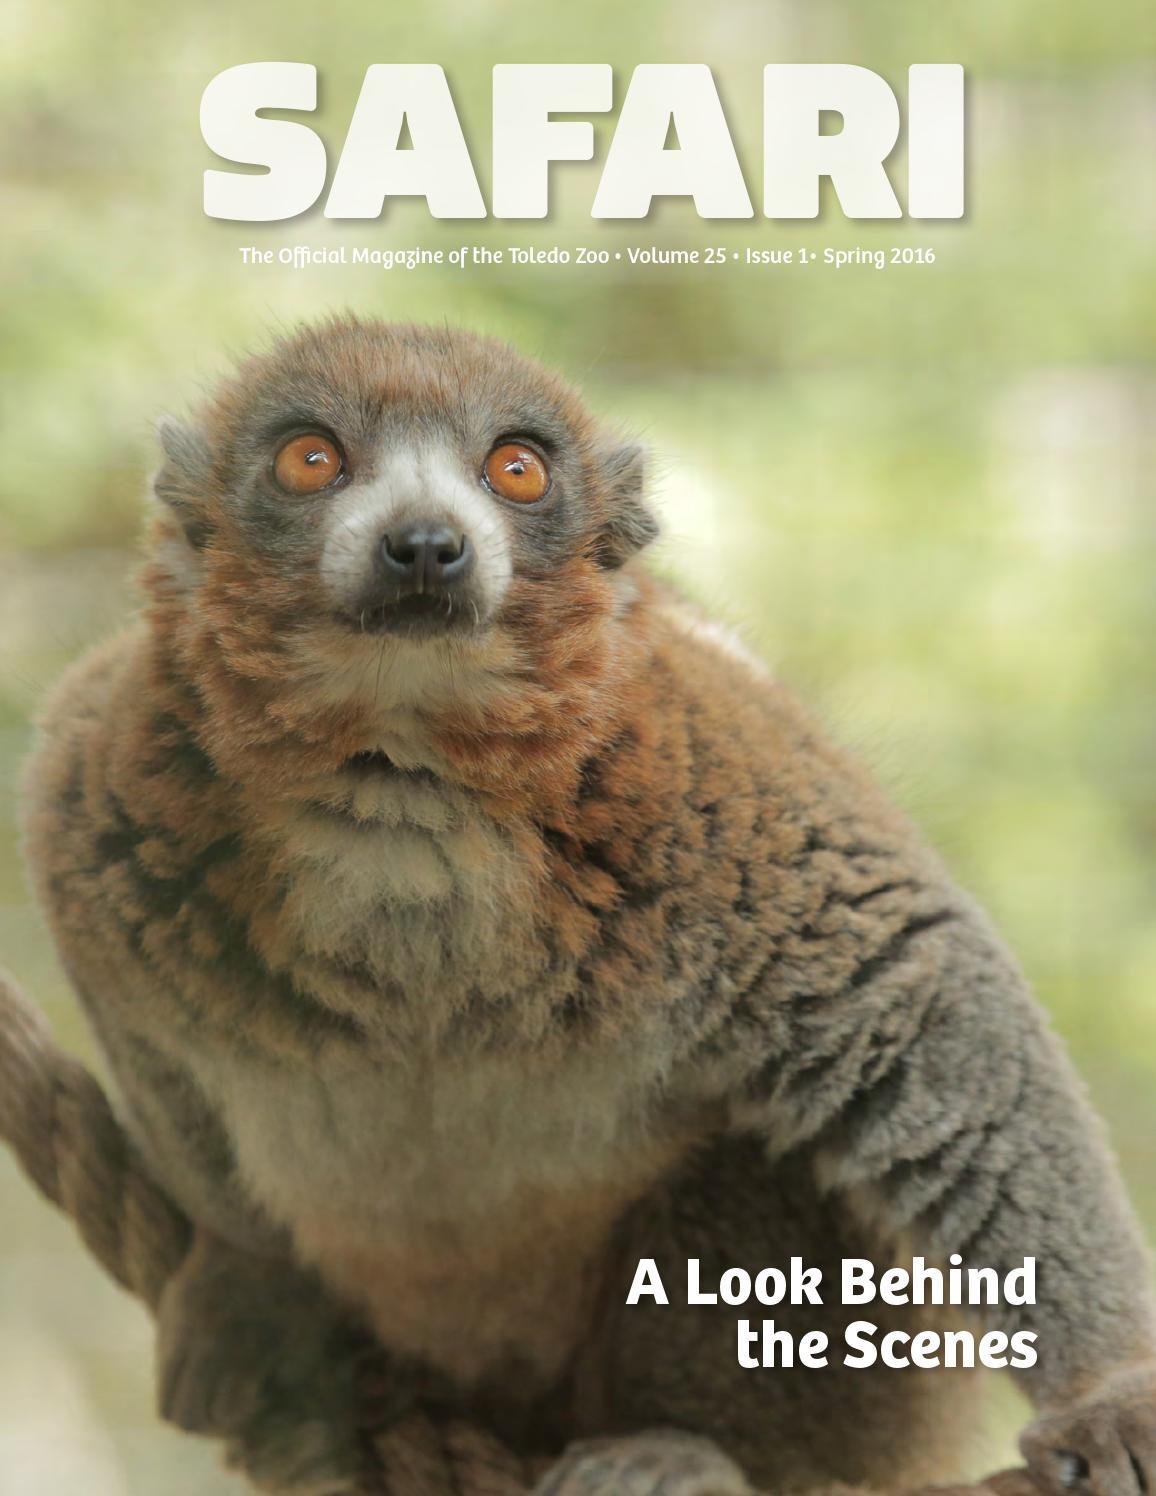 spring safari by safari magazine the toledo zoo issuu